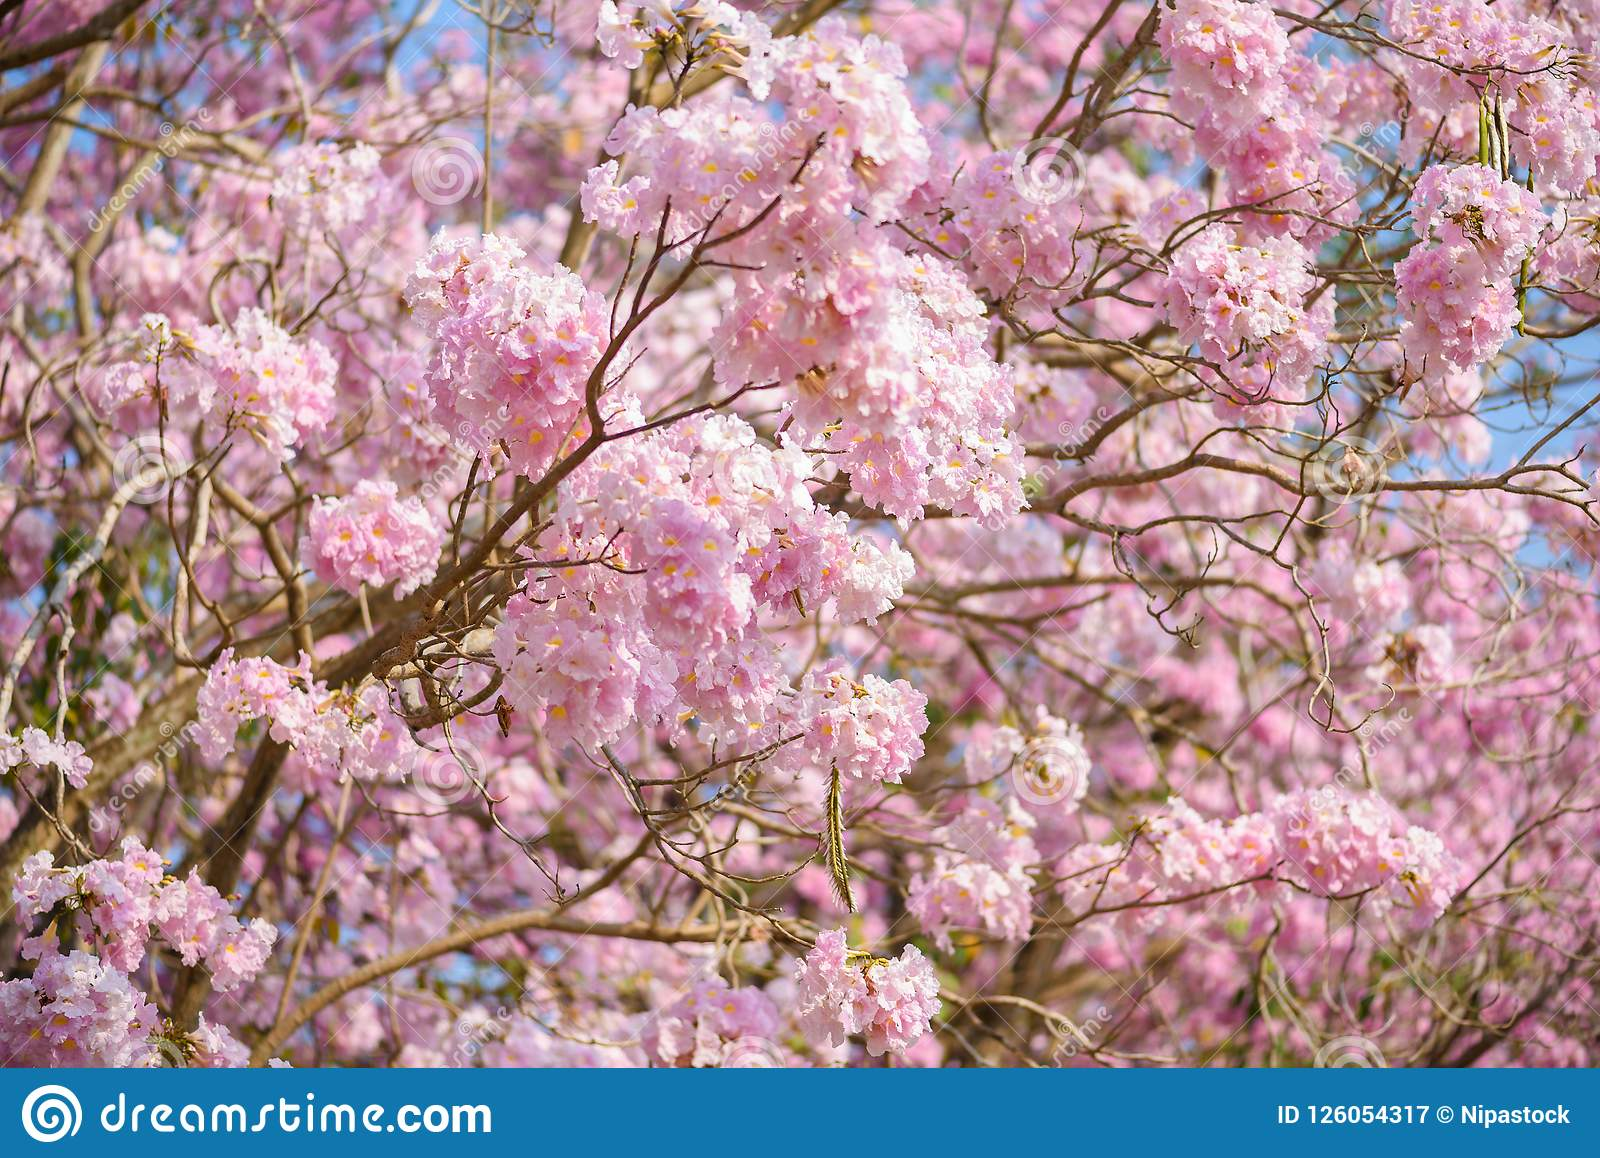 Tabebuia rosea is a pink flower neotropical tree stock image image tabebuia rosea is a pink flower neotropical tree common name pink trumpet tree pink poui pink tecoma rosy trumpet tree basant rani mightylinksfo